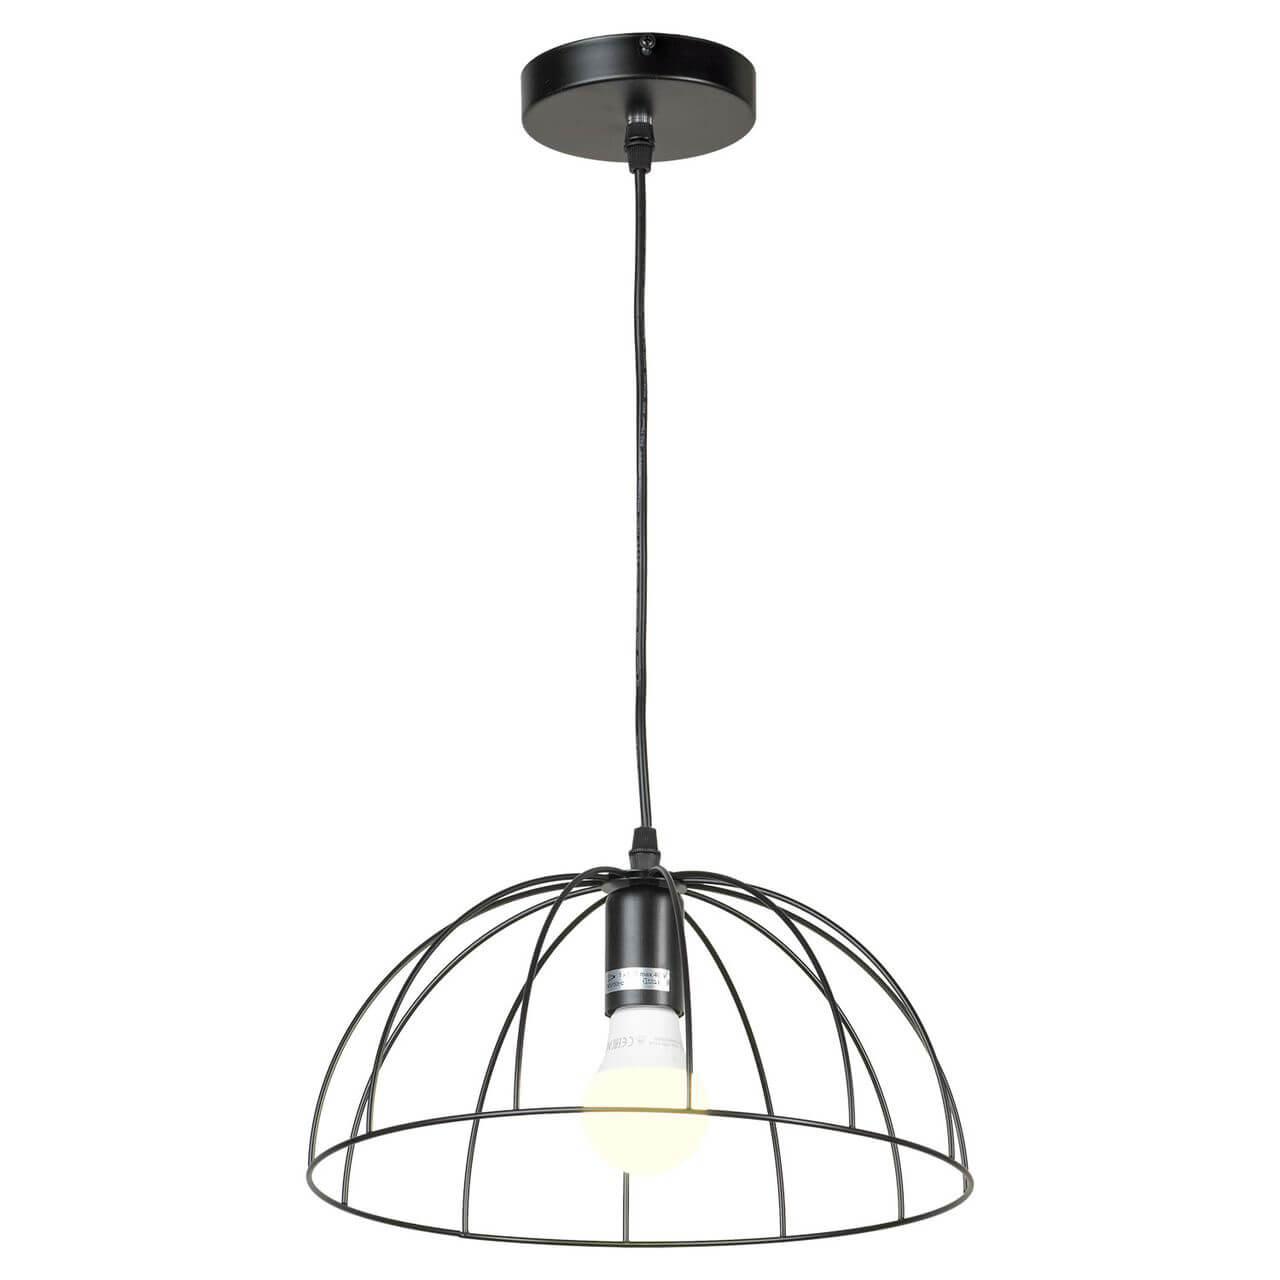 Светильник Lussole GRLSP-8213 Lattice